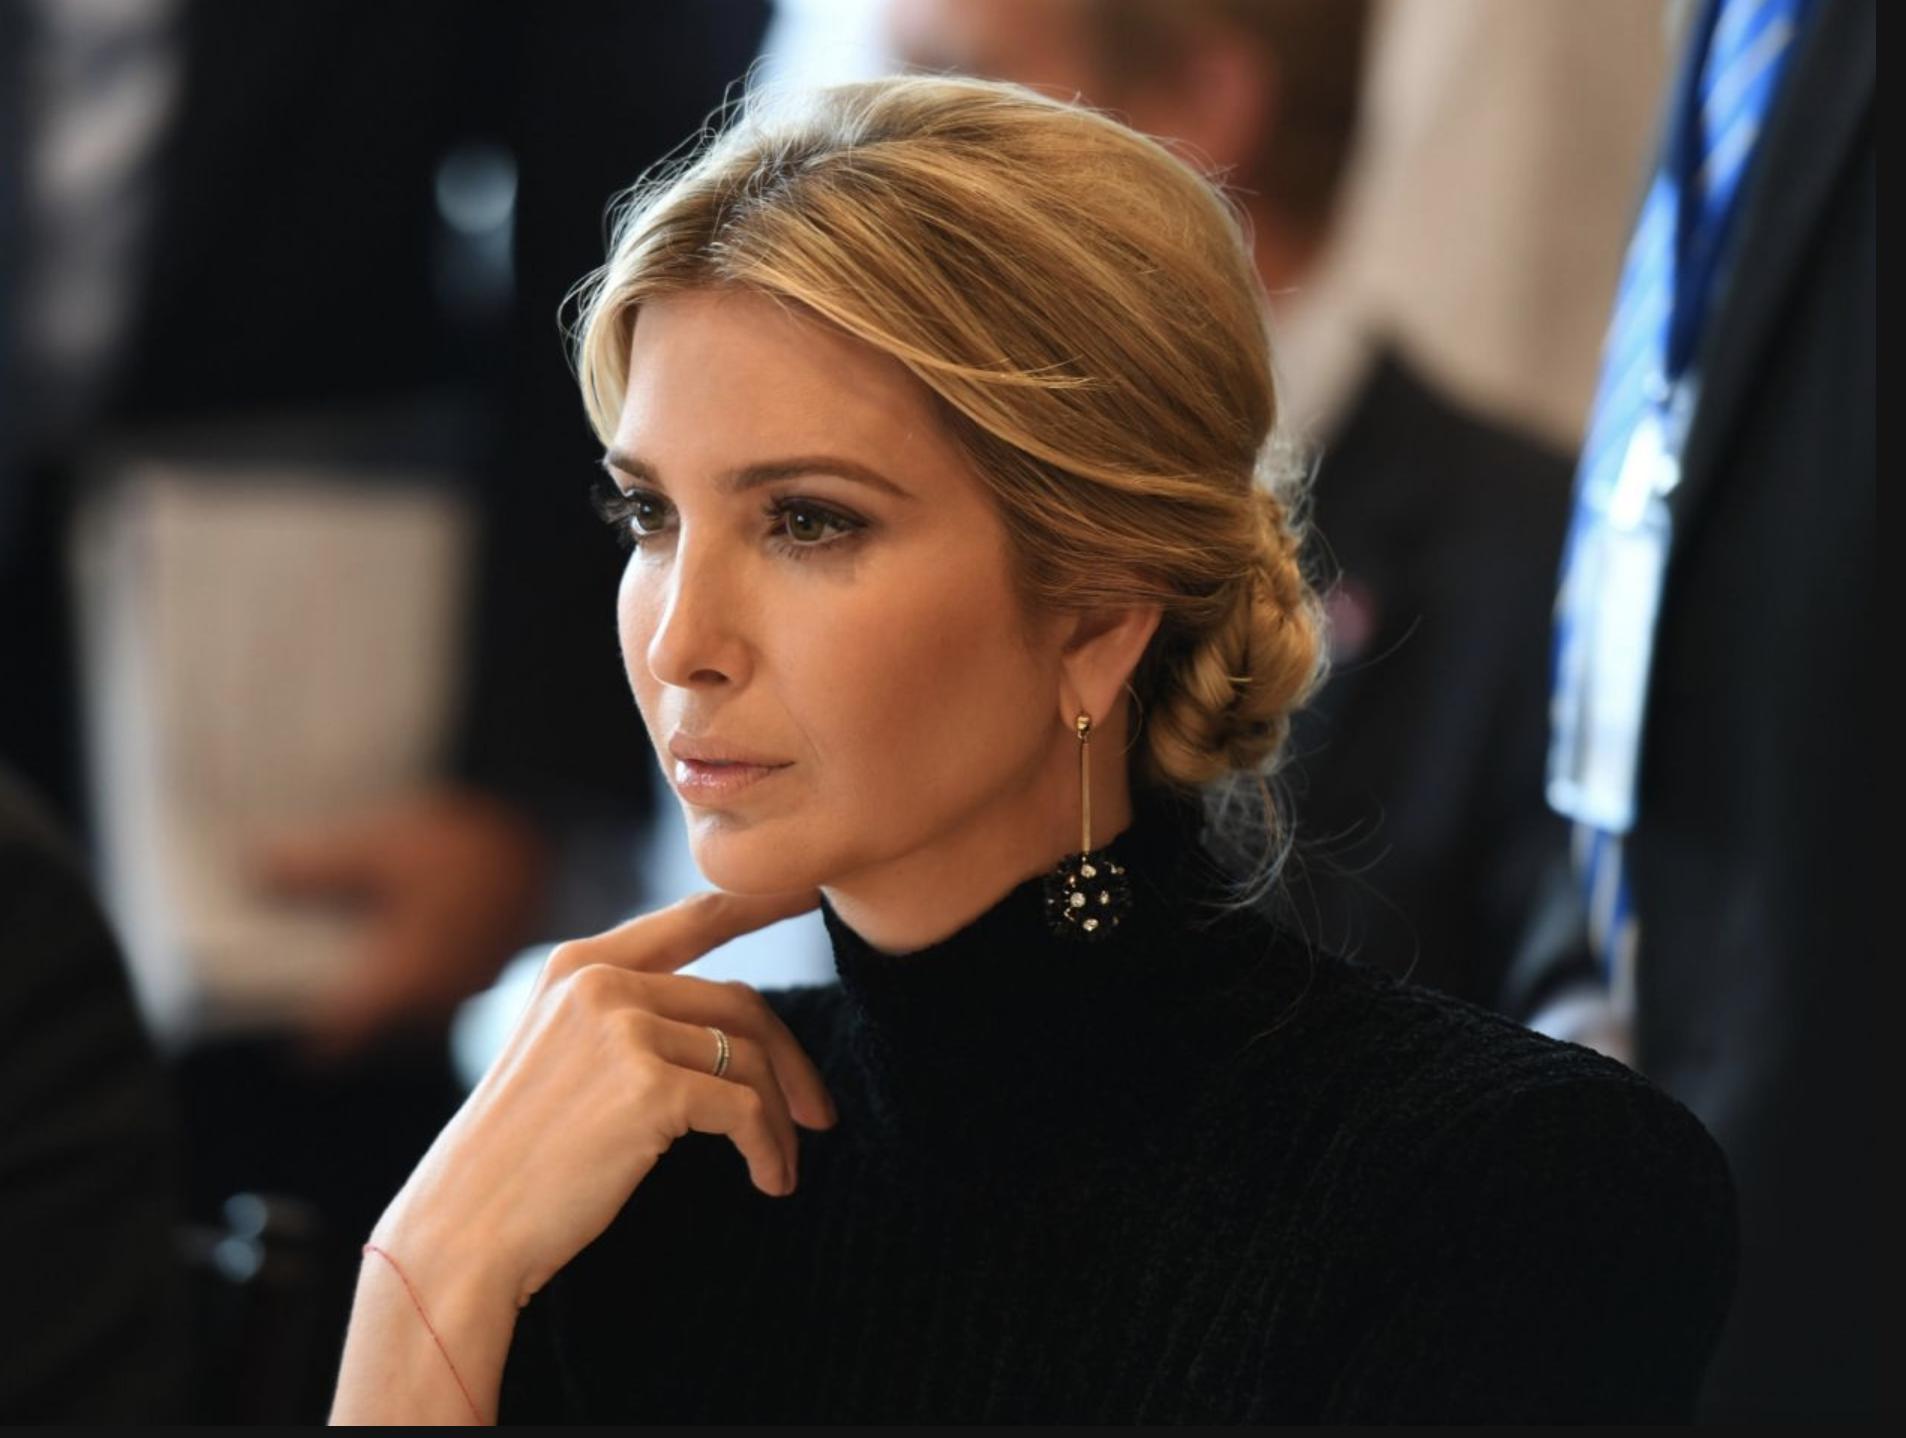 Donald Trump Jr.'s girlfriend, Kimberly Guilfoyle, calls Ivanka Trump an 'inspiration to so many women'